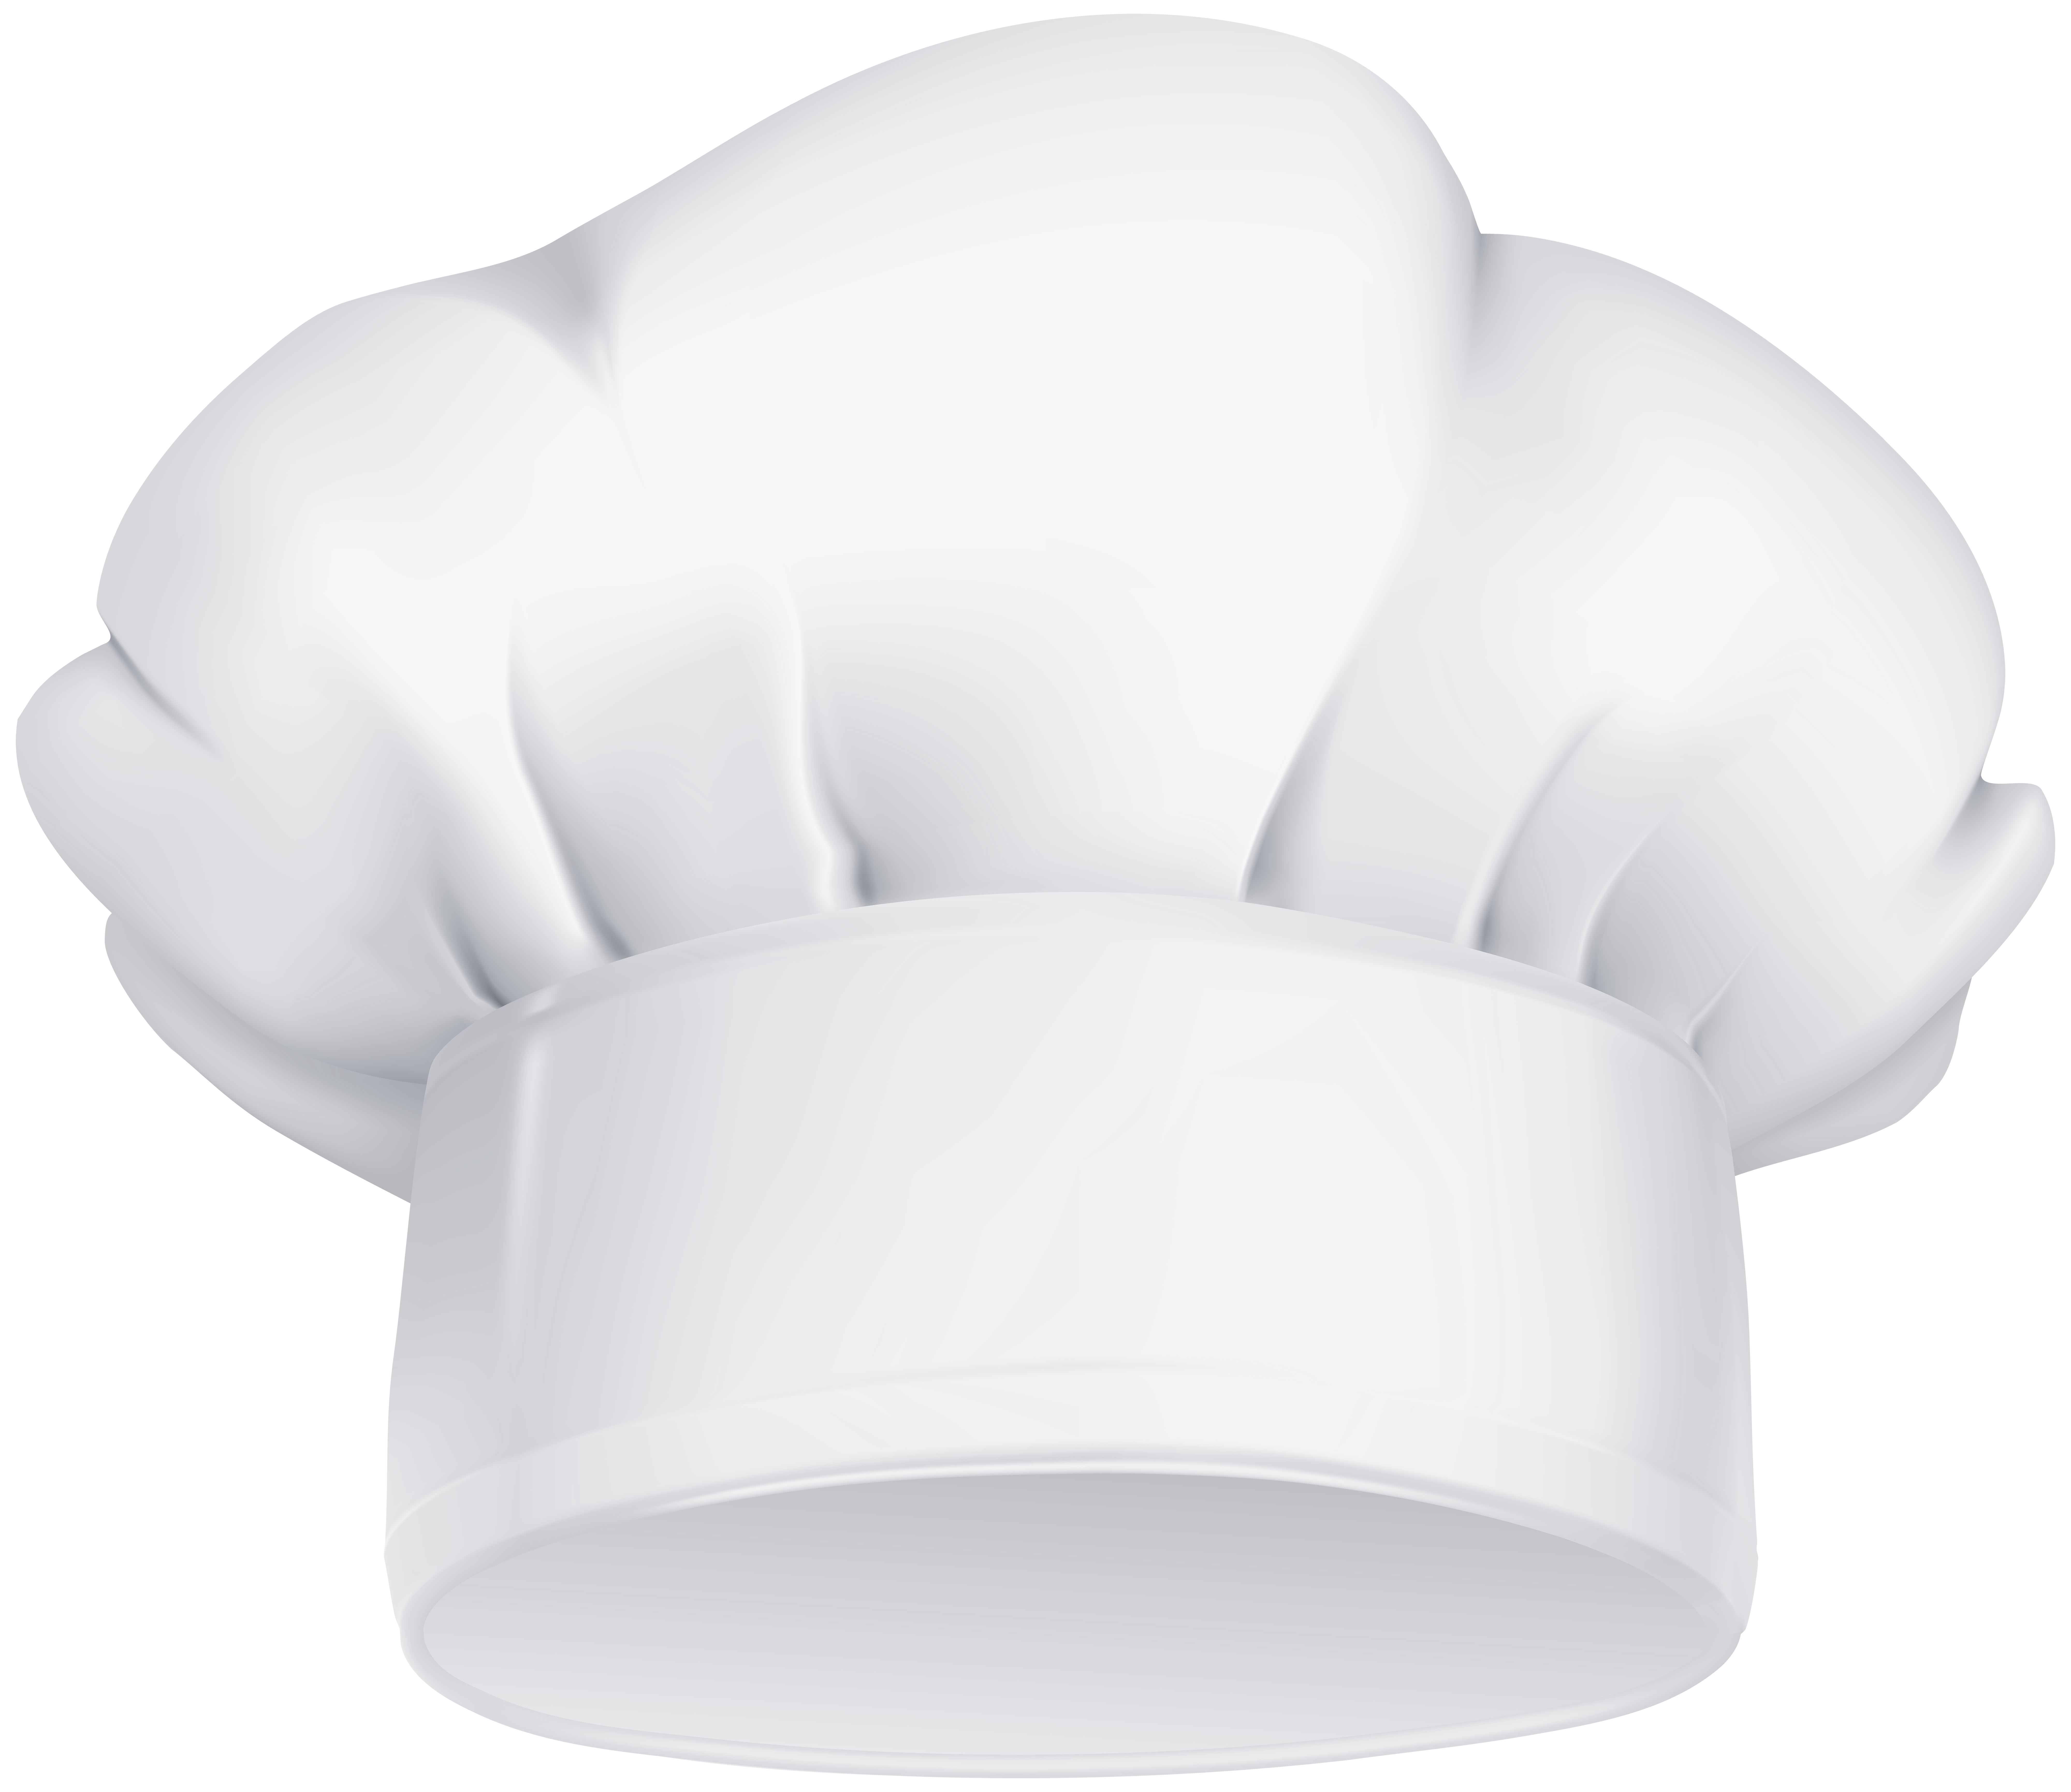 Chef Cap Chef Cap Chefs Hat Hat Png